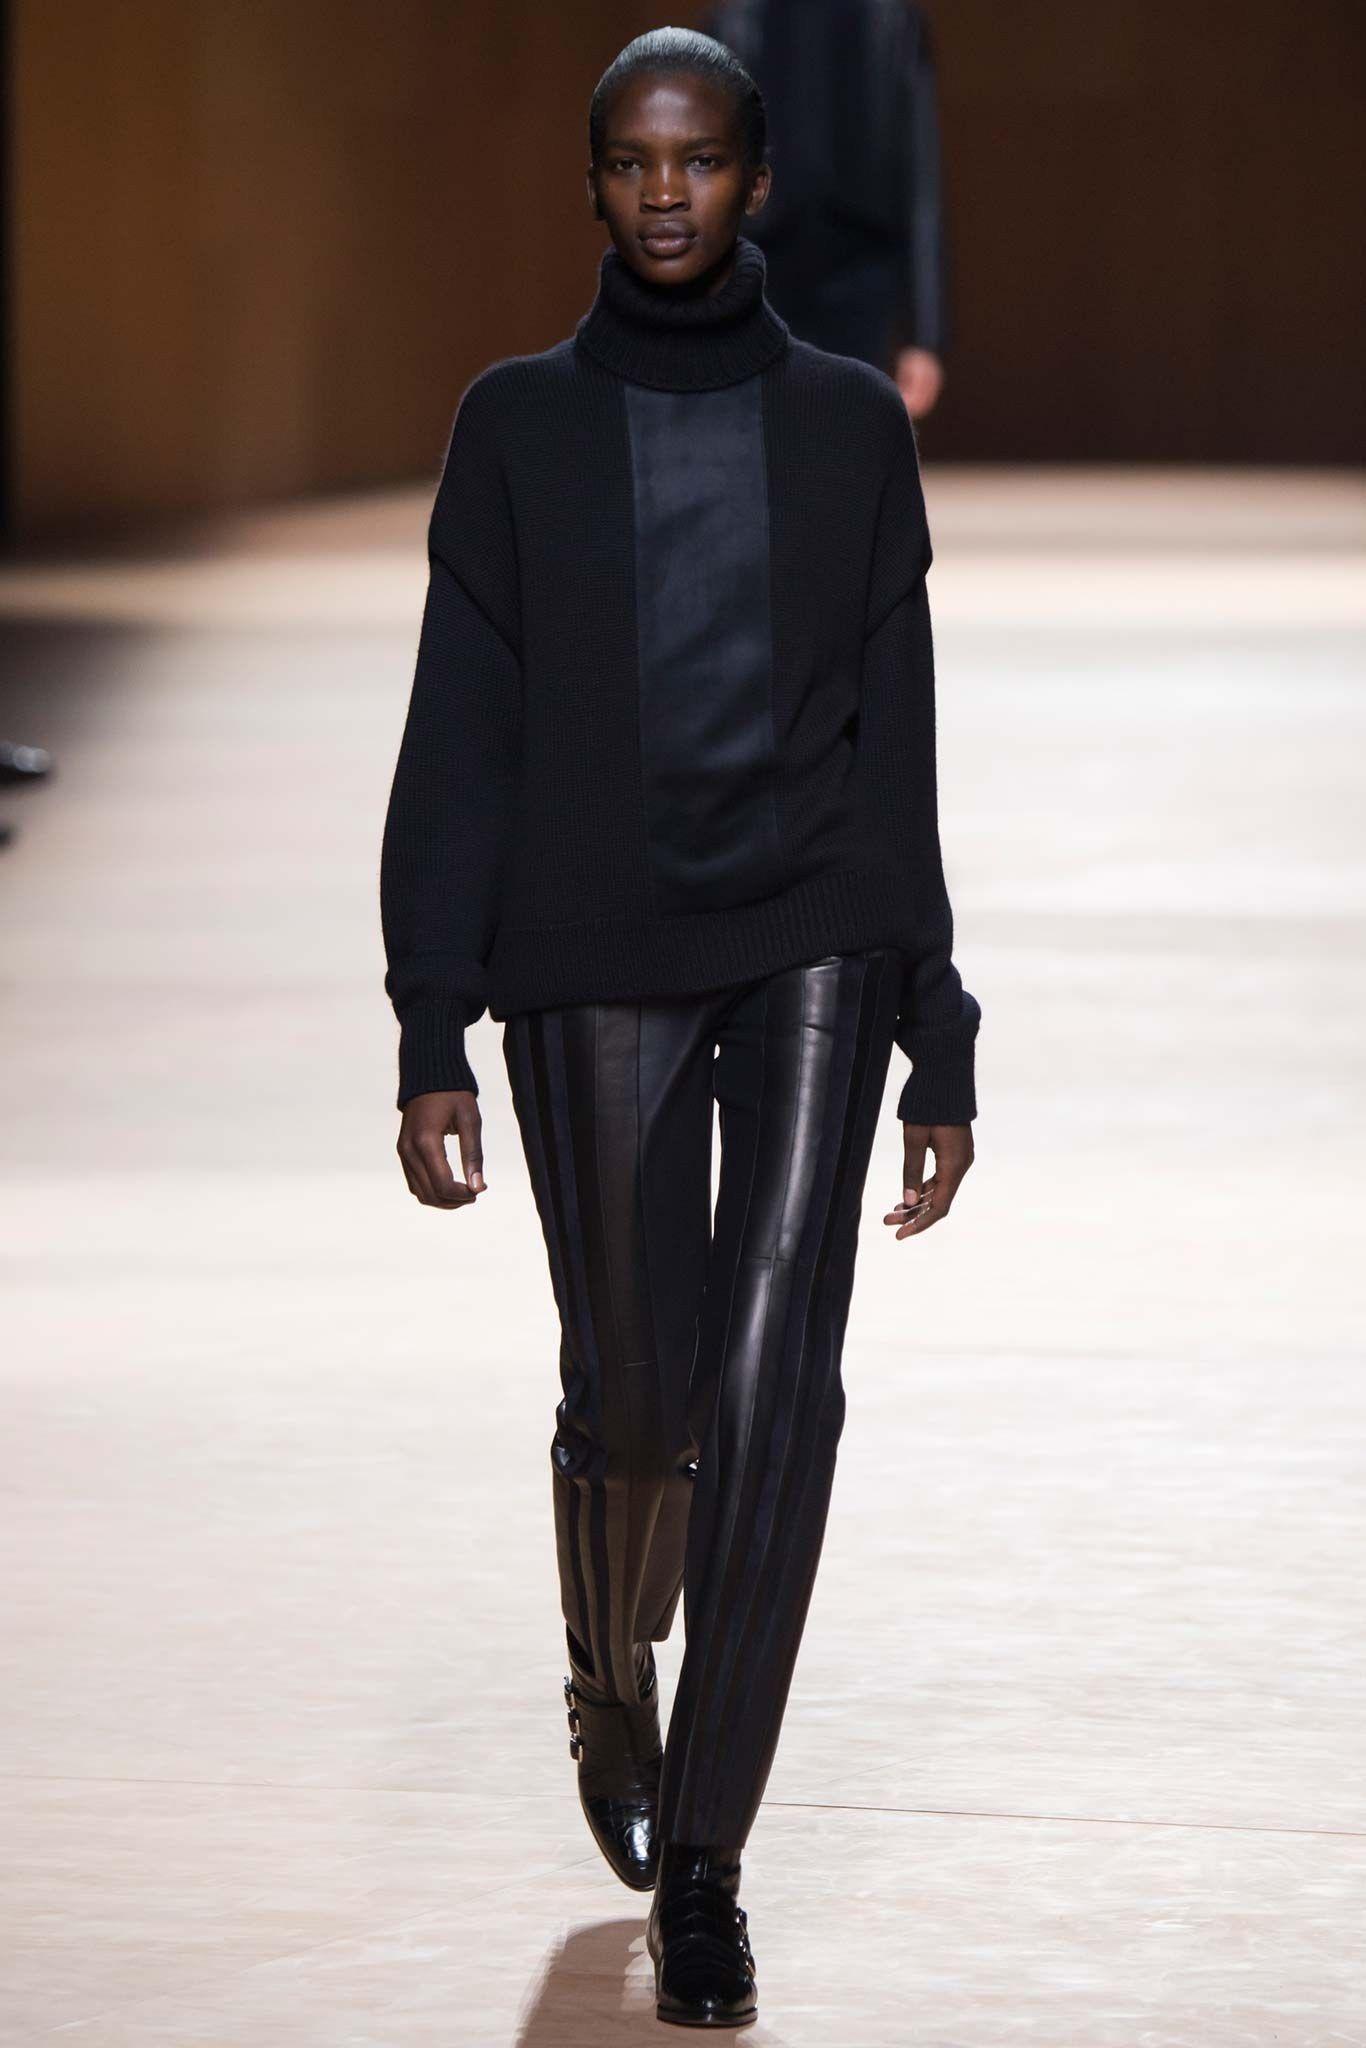 Hermès Fall 2015 Ready-to-Wear Fashion Show - Aamito Stacie Lagum